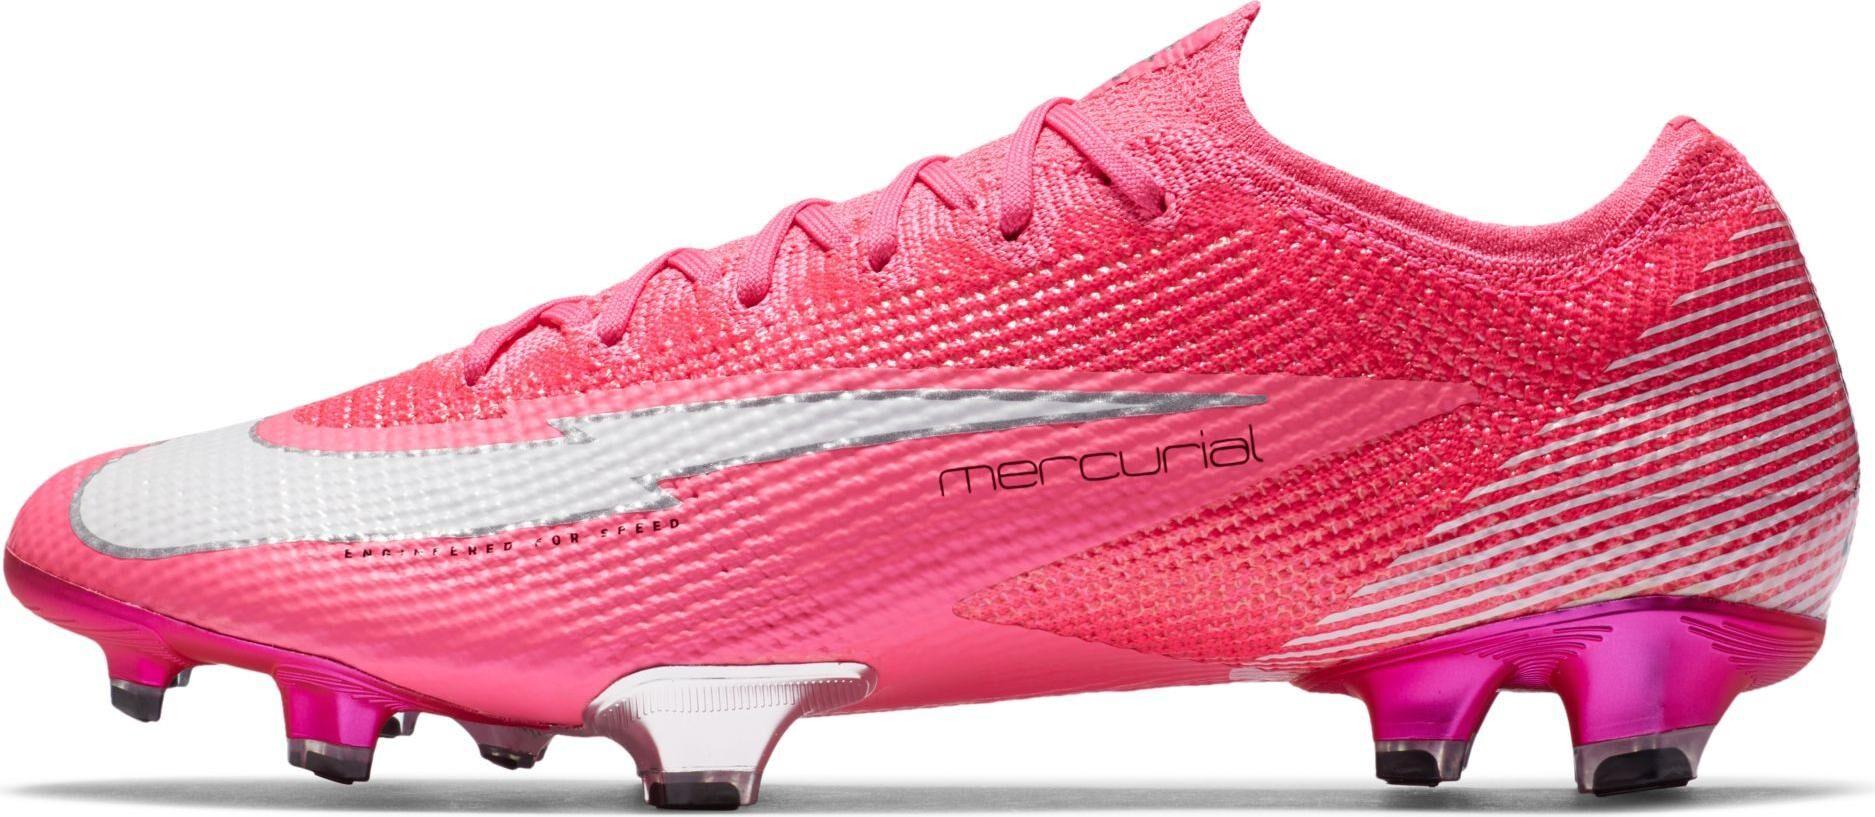 Nike Botas de fútbol Nike VAPOR 13 ELITE MBAPPE ROSA FG db5603-611 Talla 47 EU